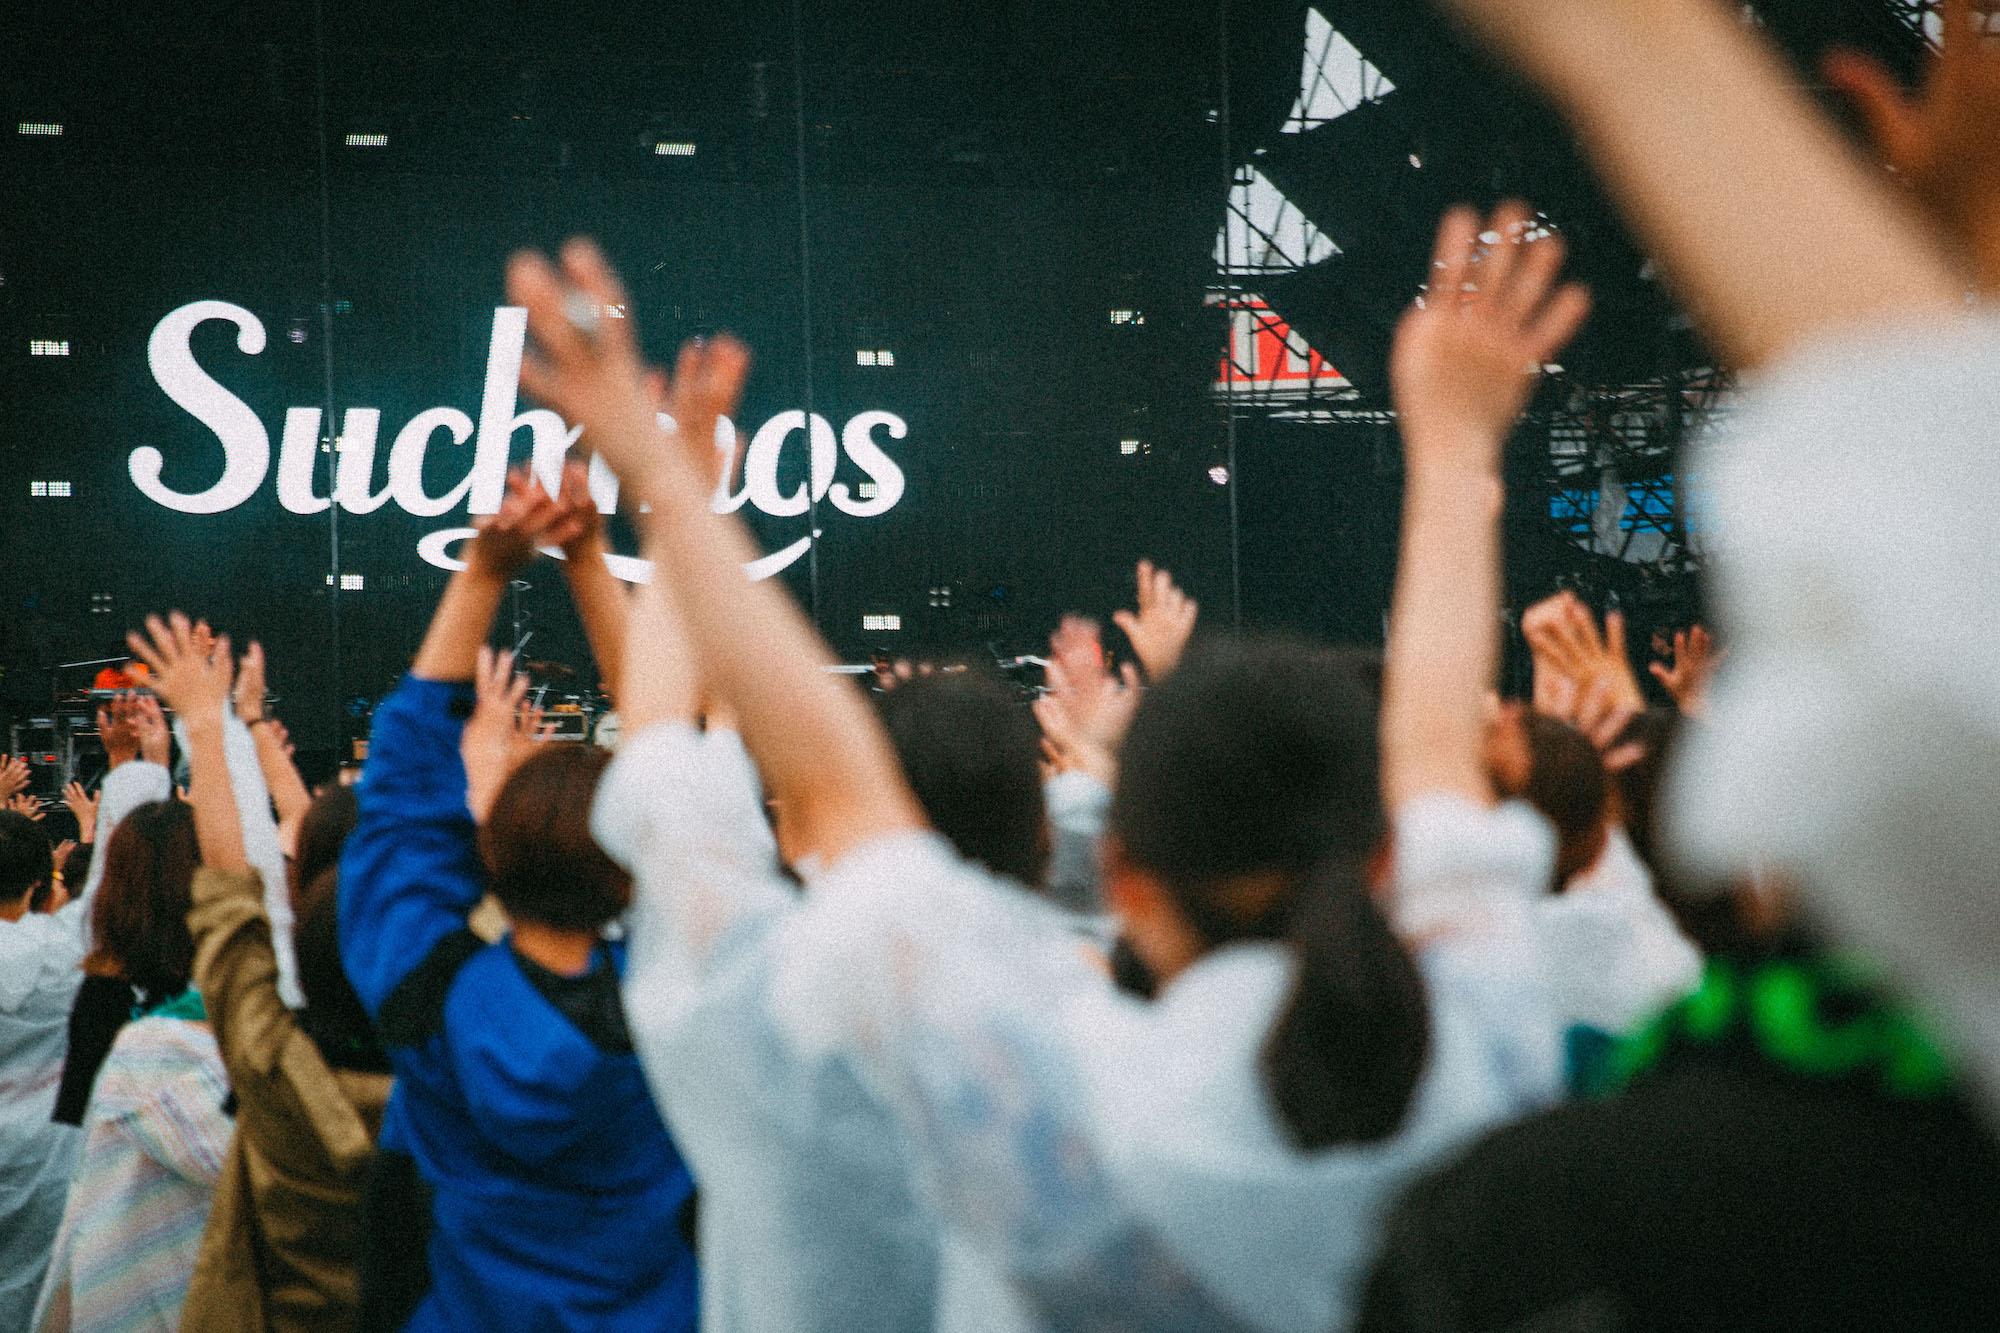 【Photo Documentary】Suchmos THE LIVE 横浜スタジアム report0920_suchmos_16